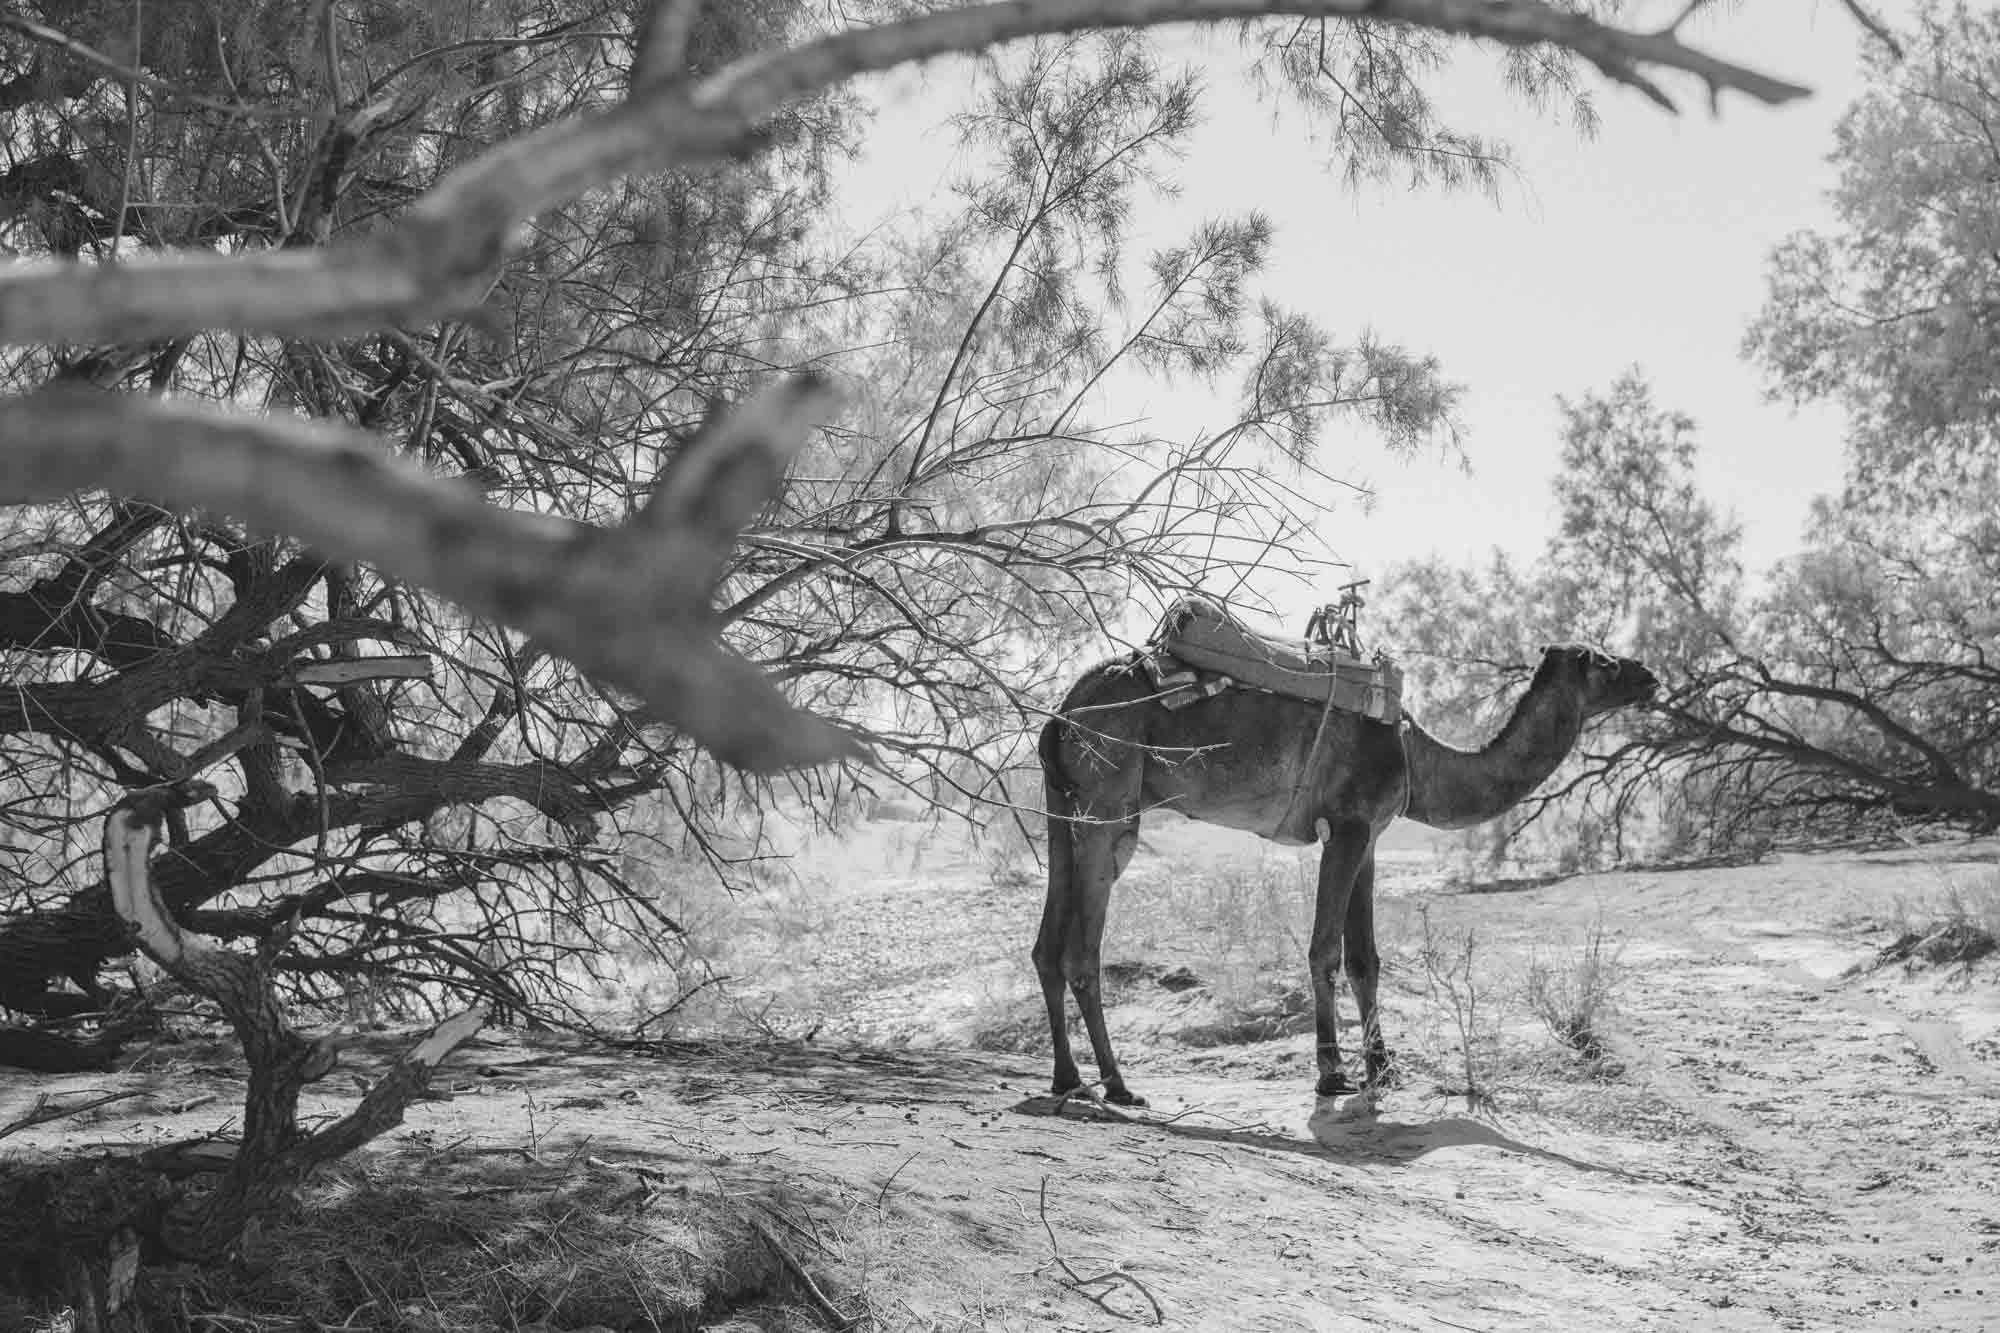 Tour Camel Saddled up taking Shade Under Trees at Luxury-Desert-Camp Morocco